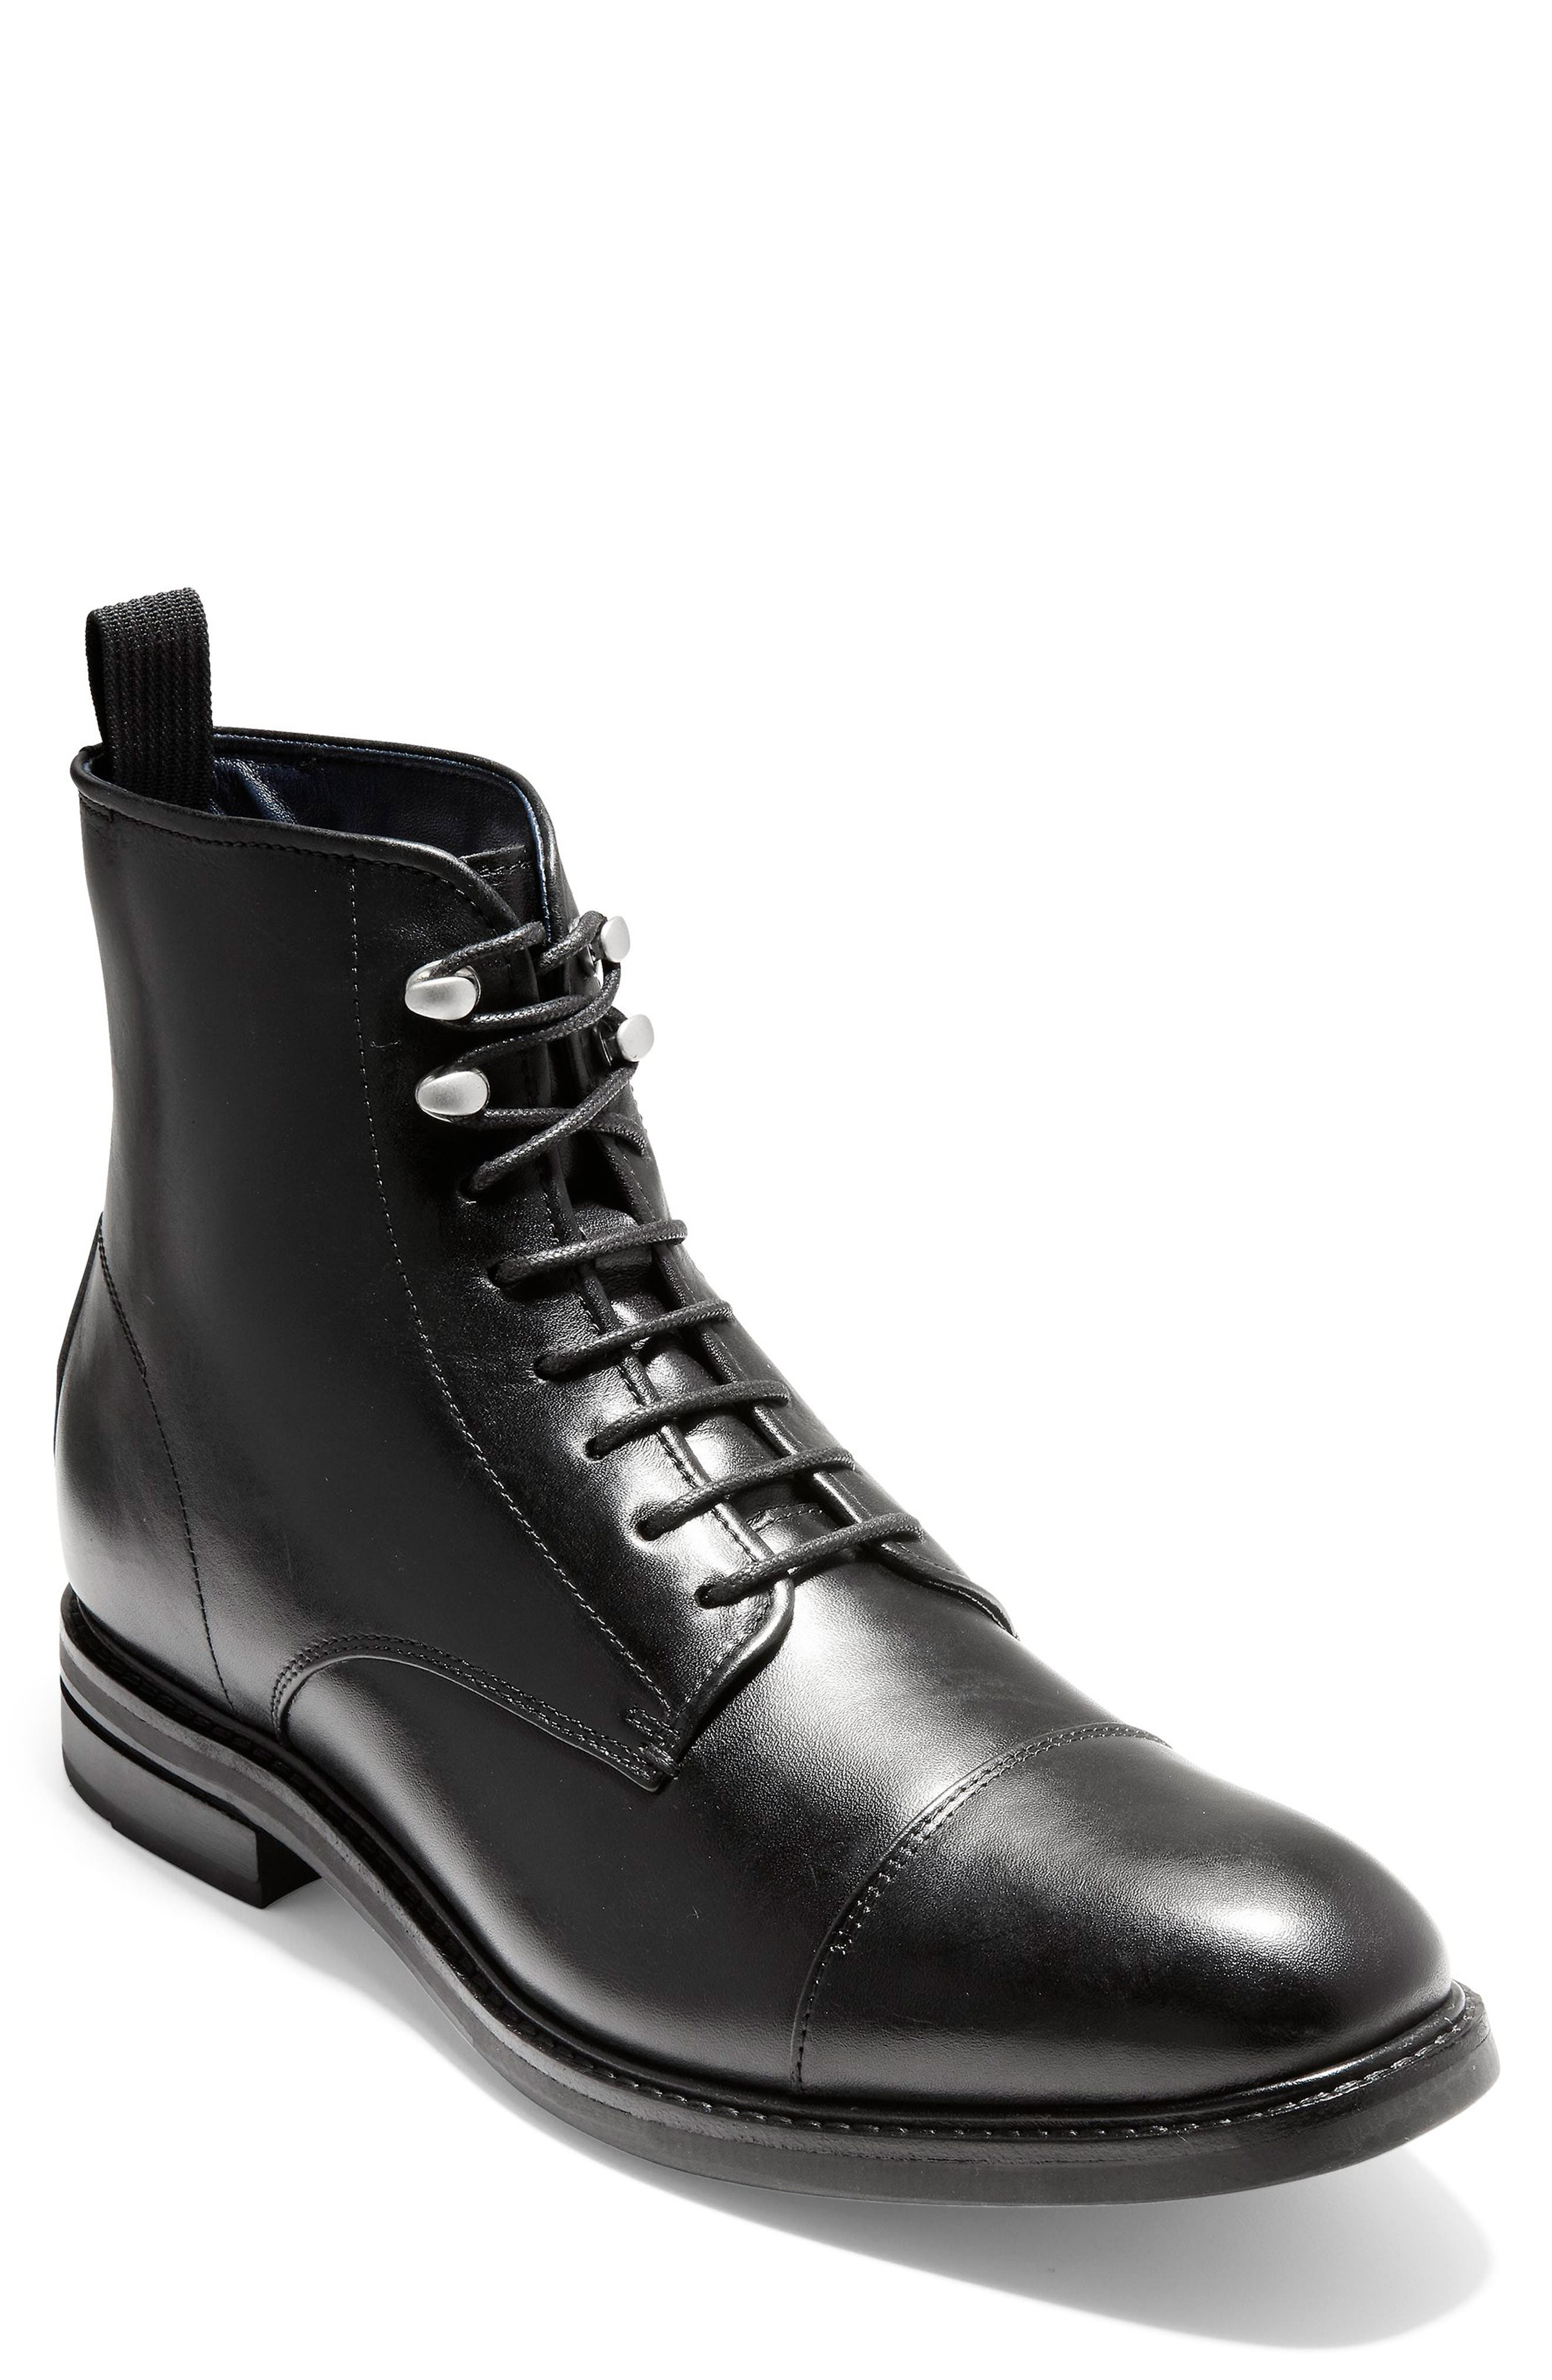 Wagner Grand Cap Toe Boot,                             Main thumbnail 1, color,                             BLACK LEATHER